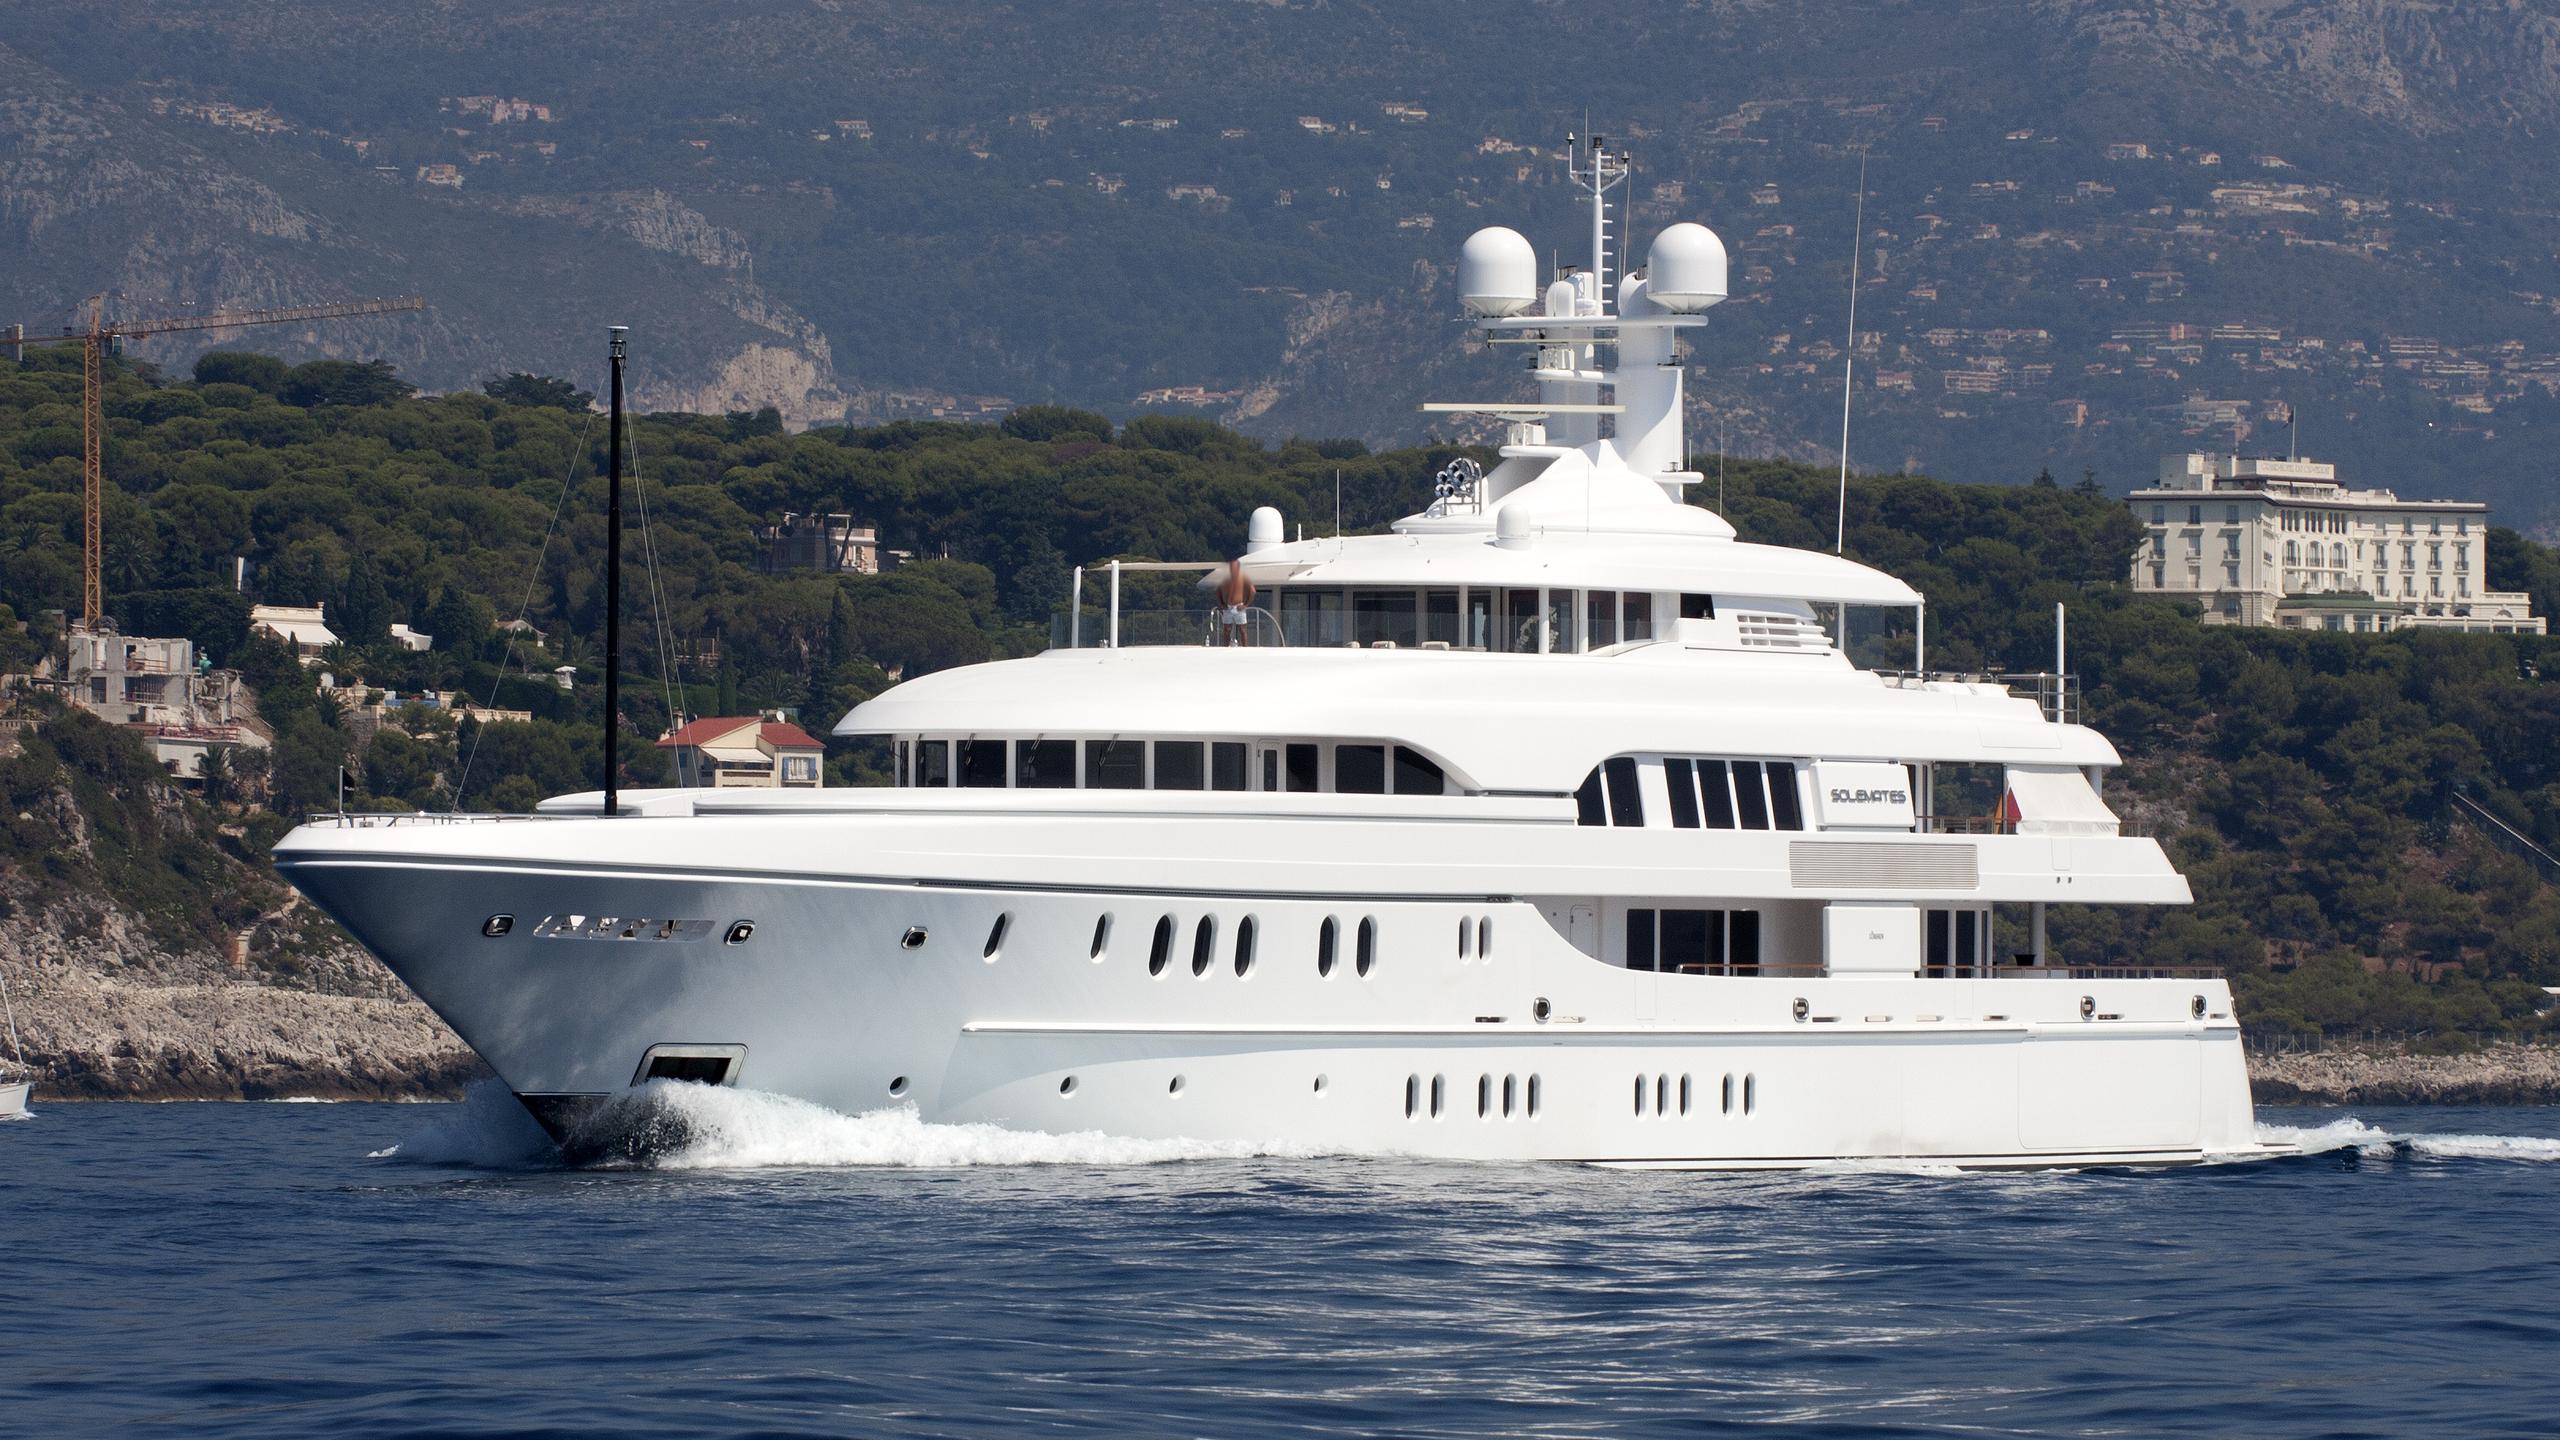 huntress-motor-yacht-lurssen-2010-60m--profile